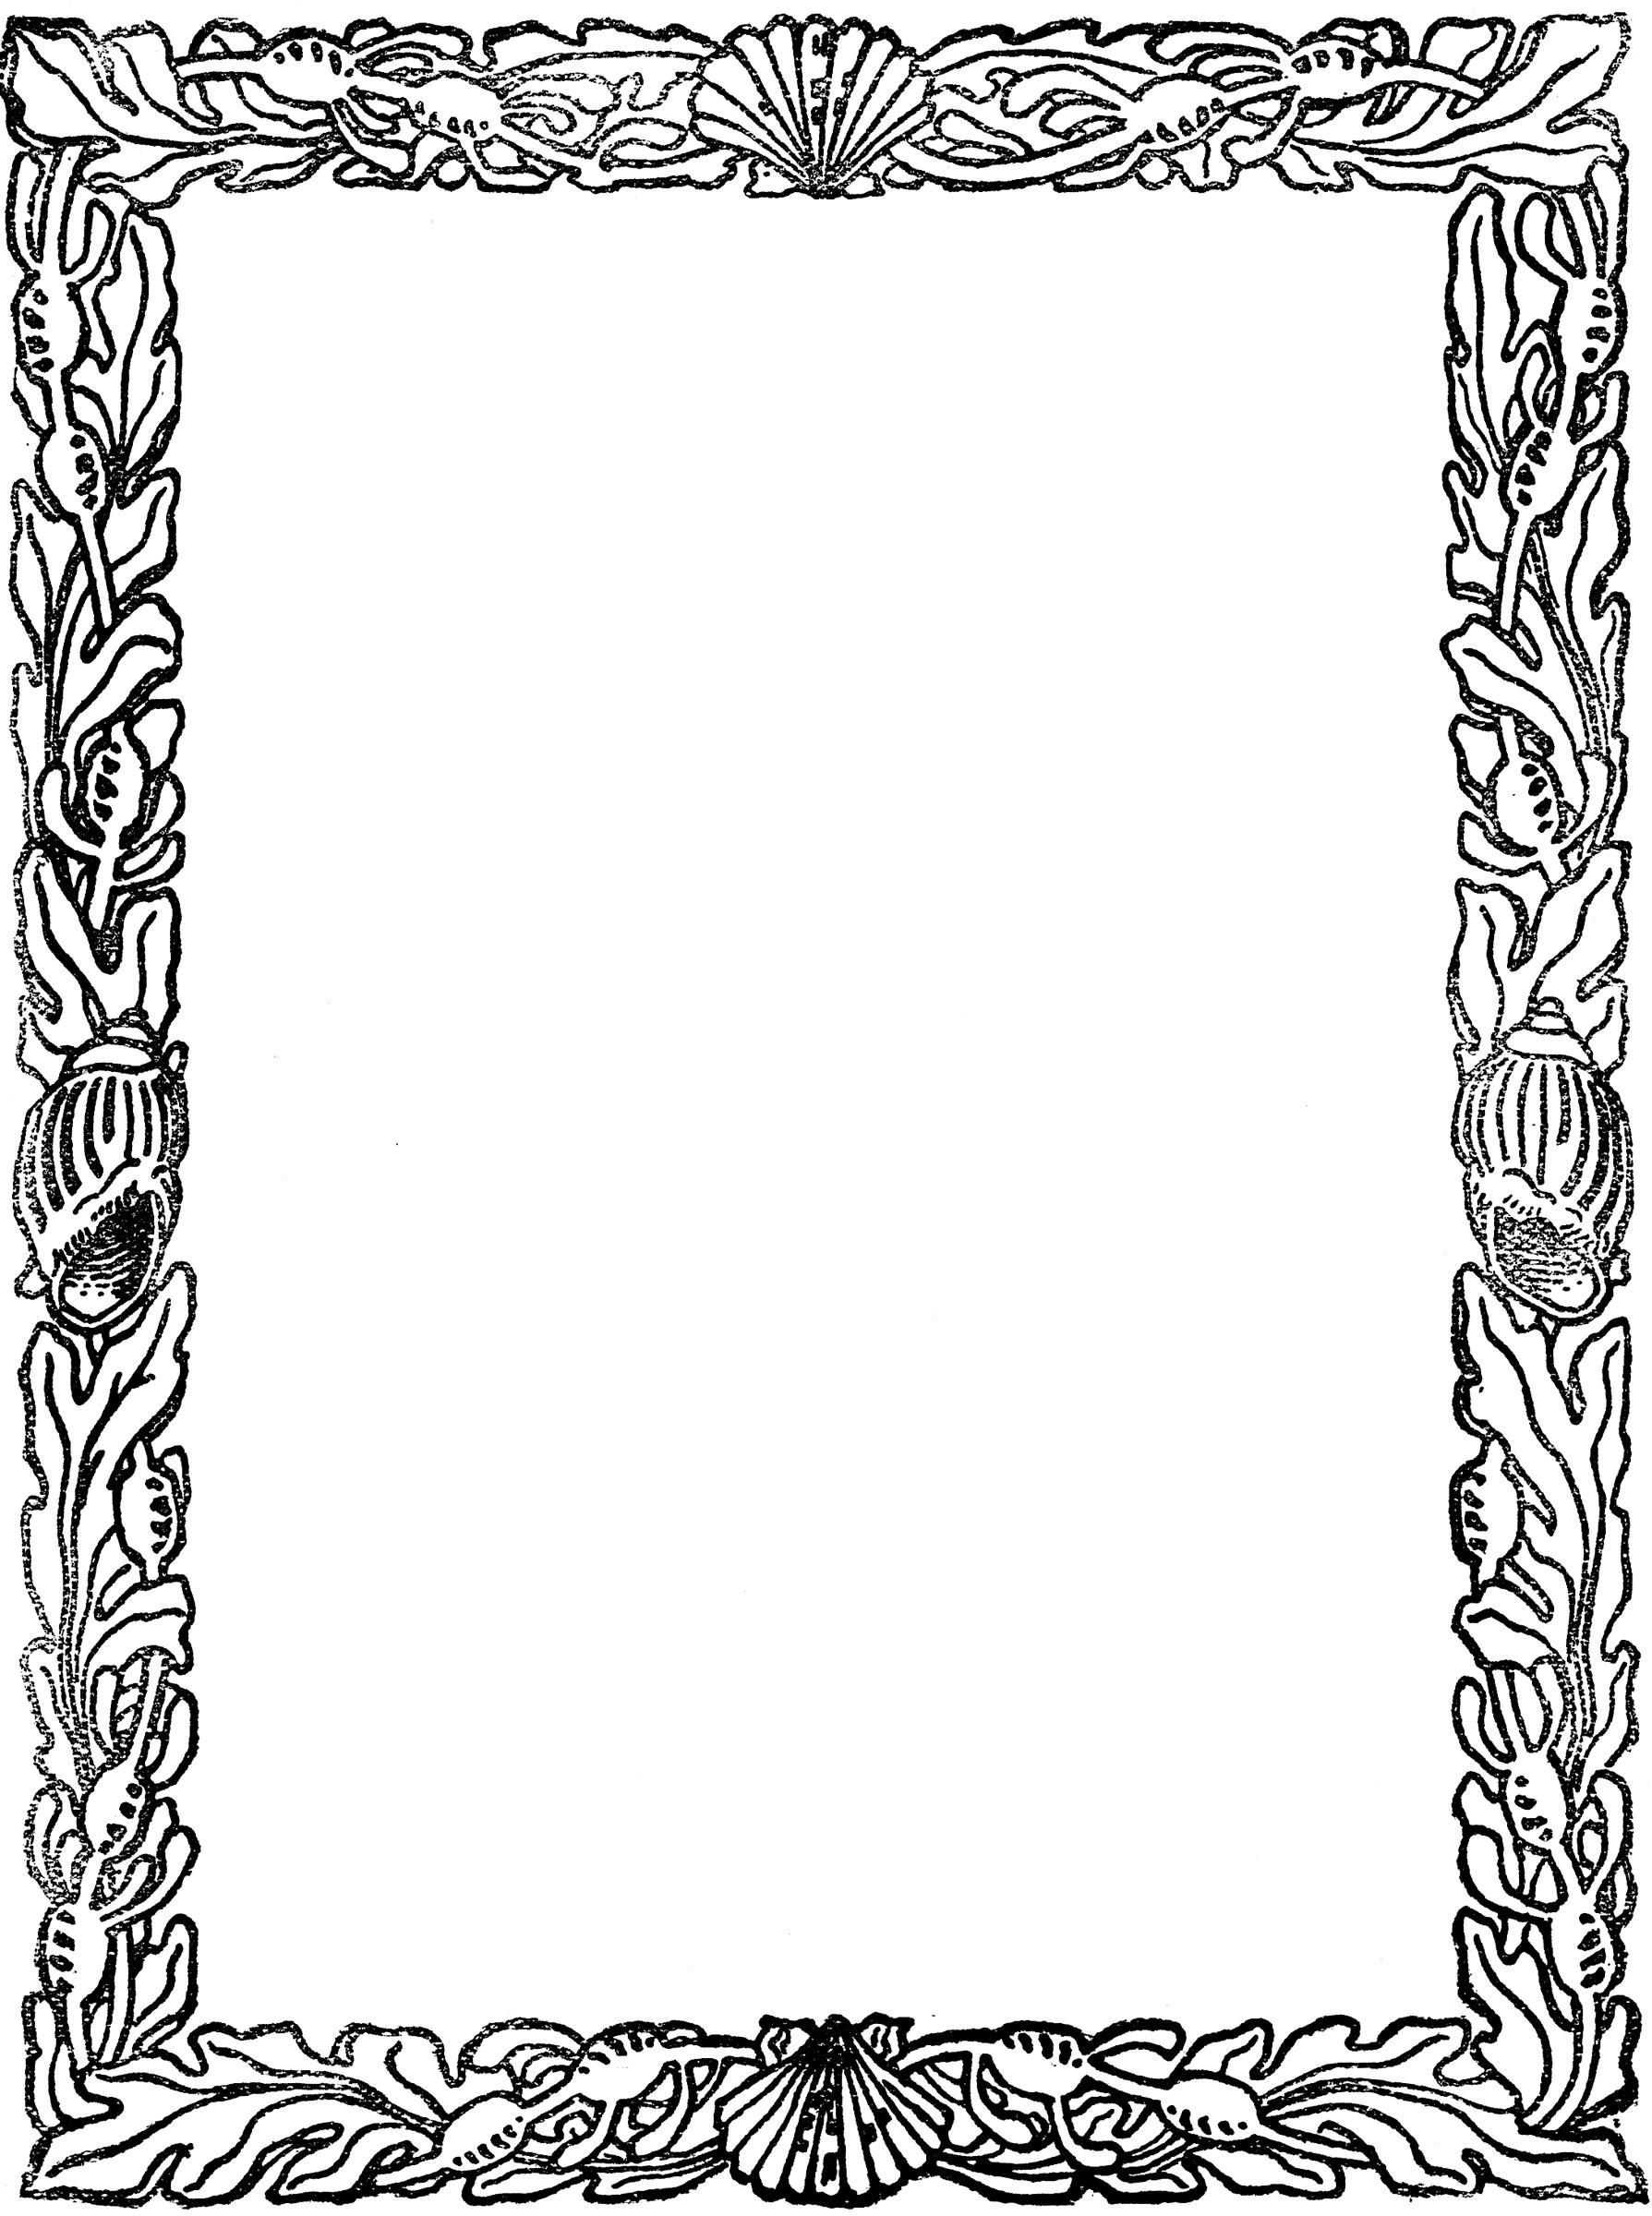 Cute Word Wallpaper Seashell Border Clipart Etc